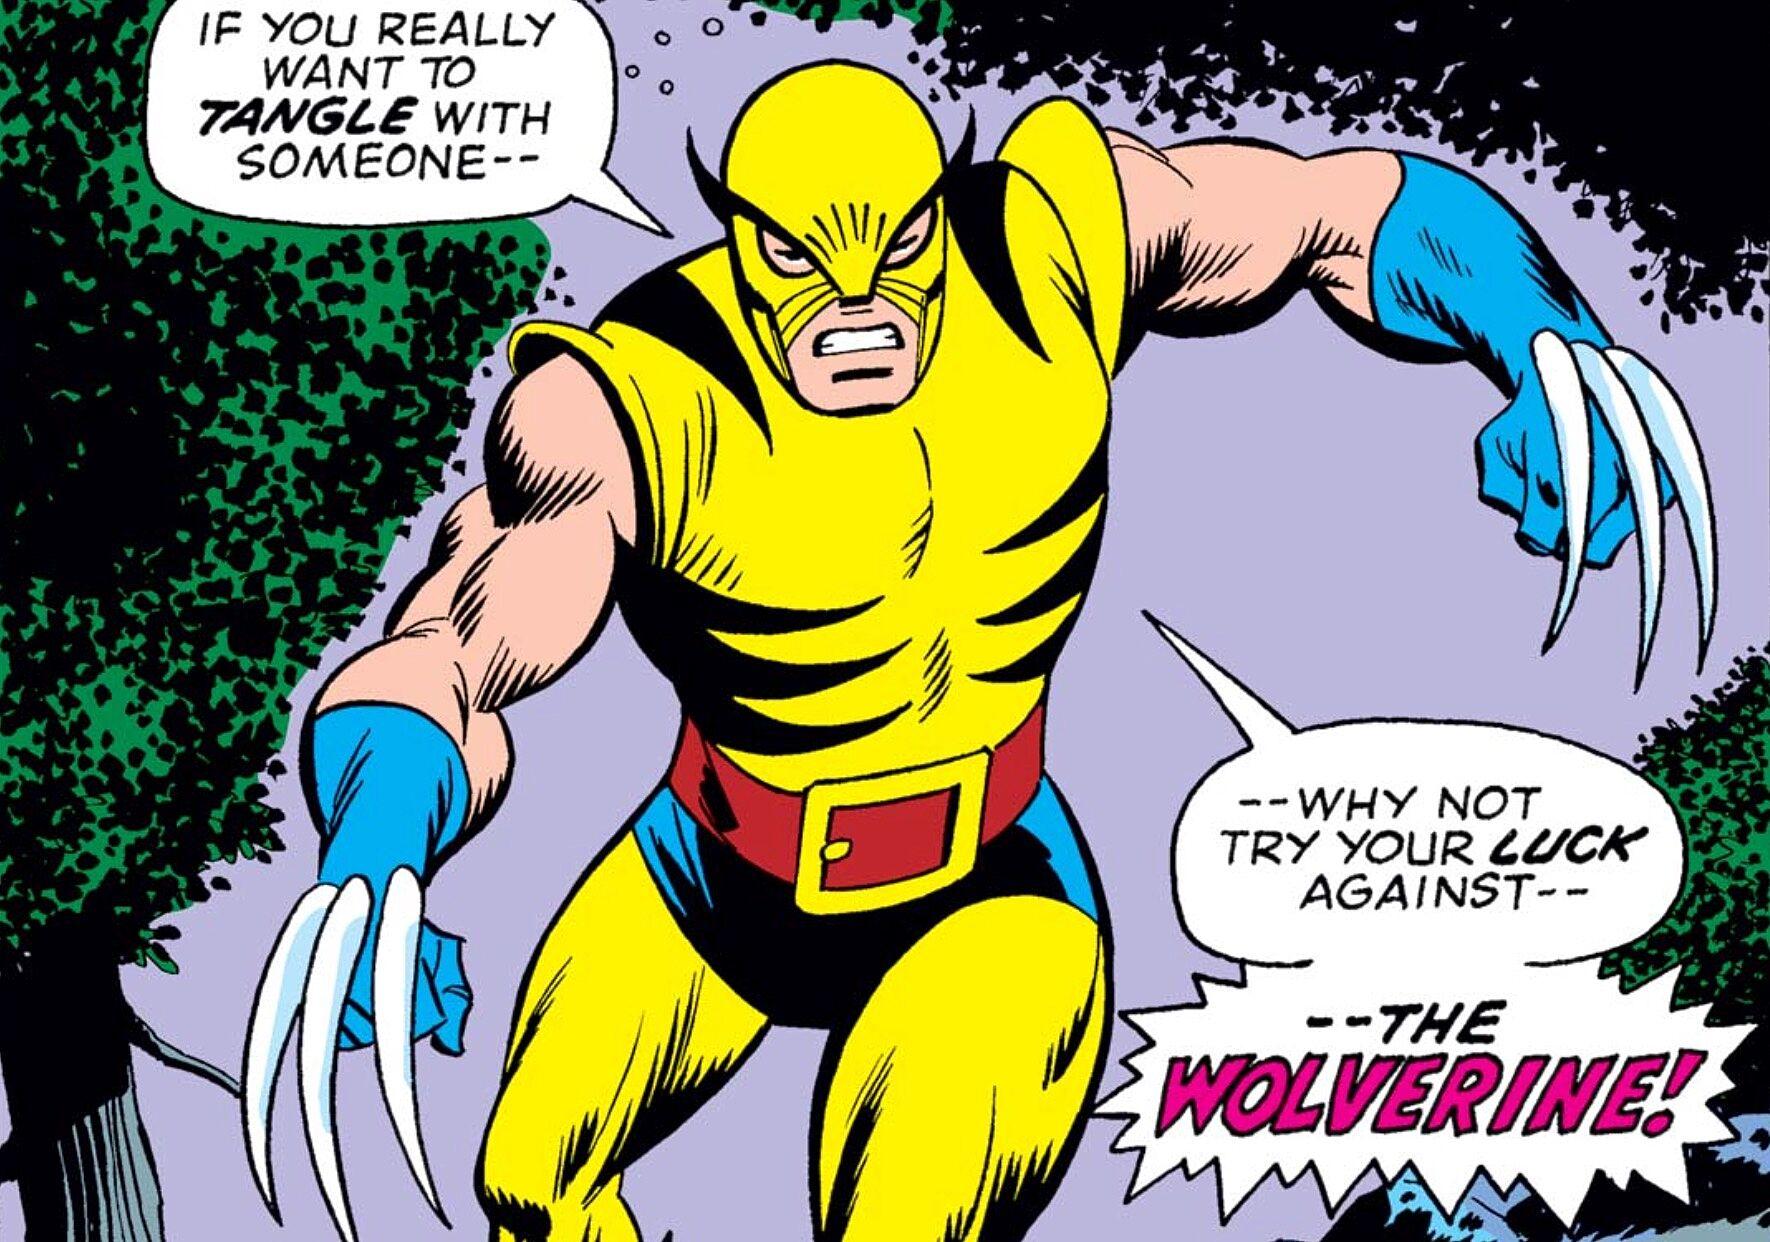 Image Source: Marvel Digital Comics